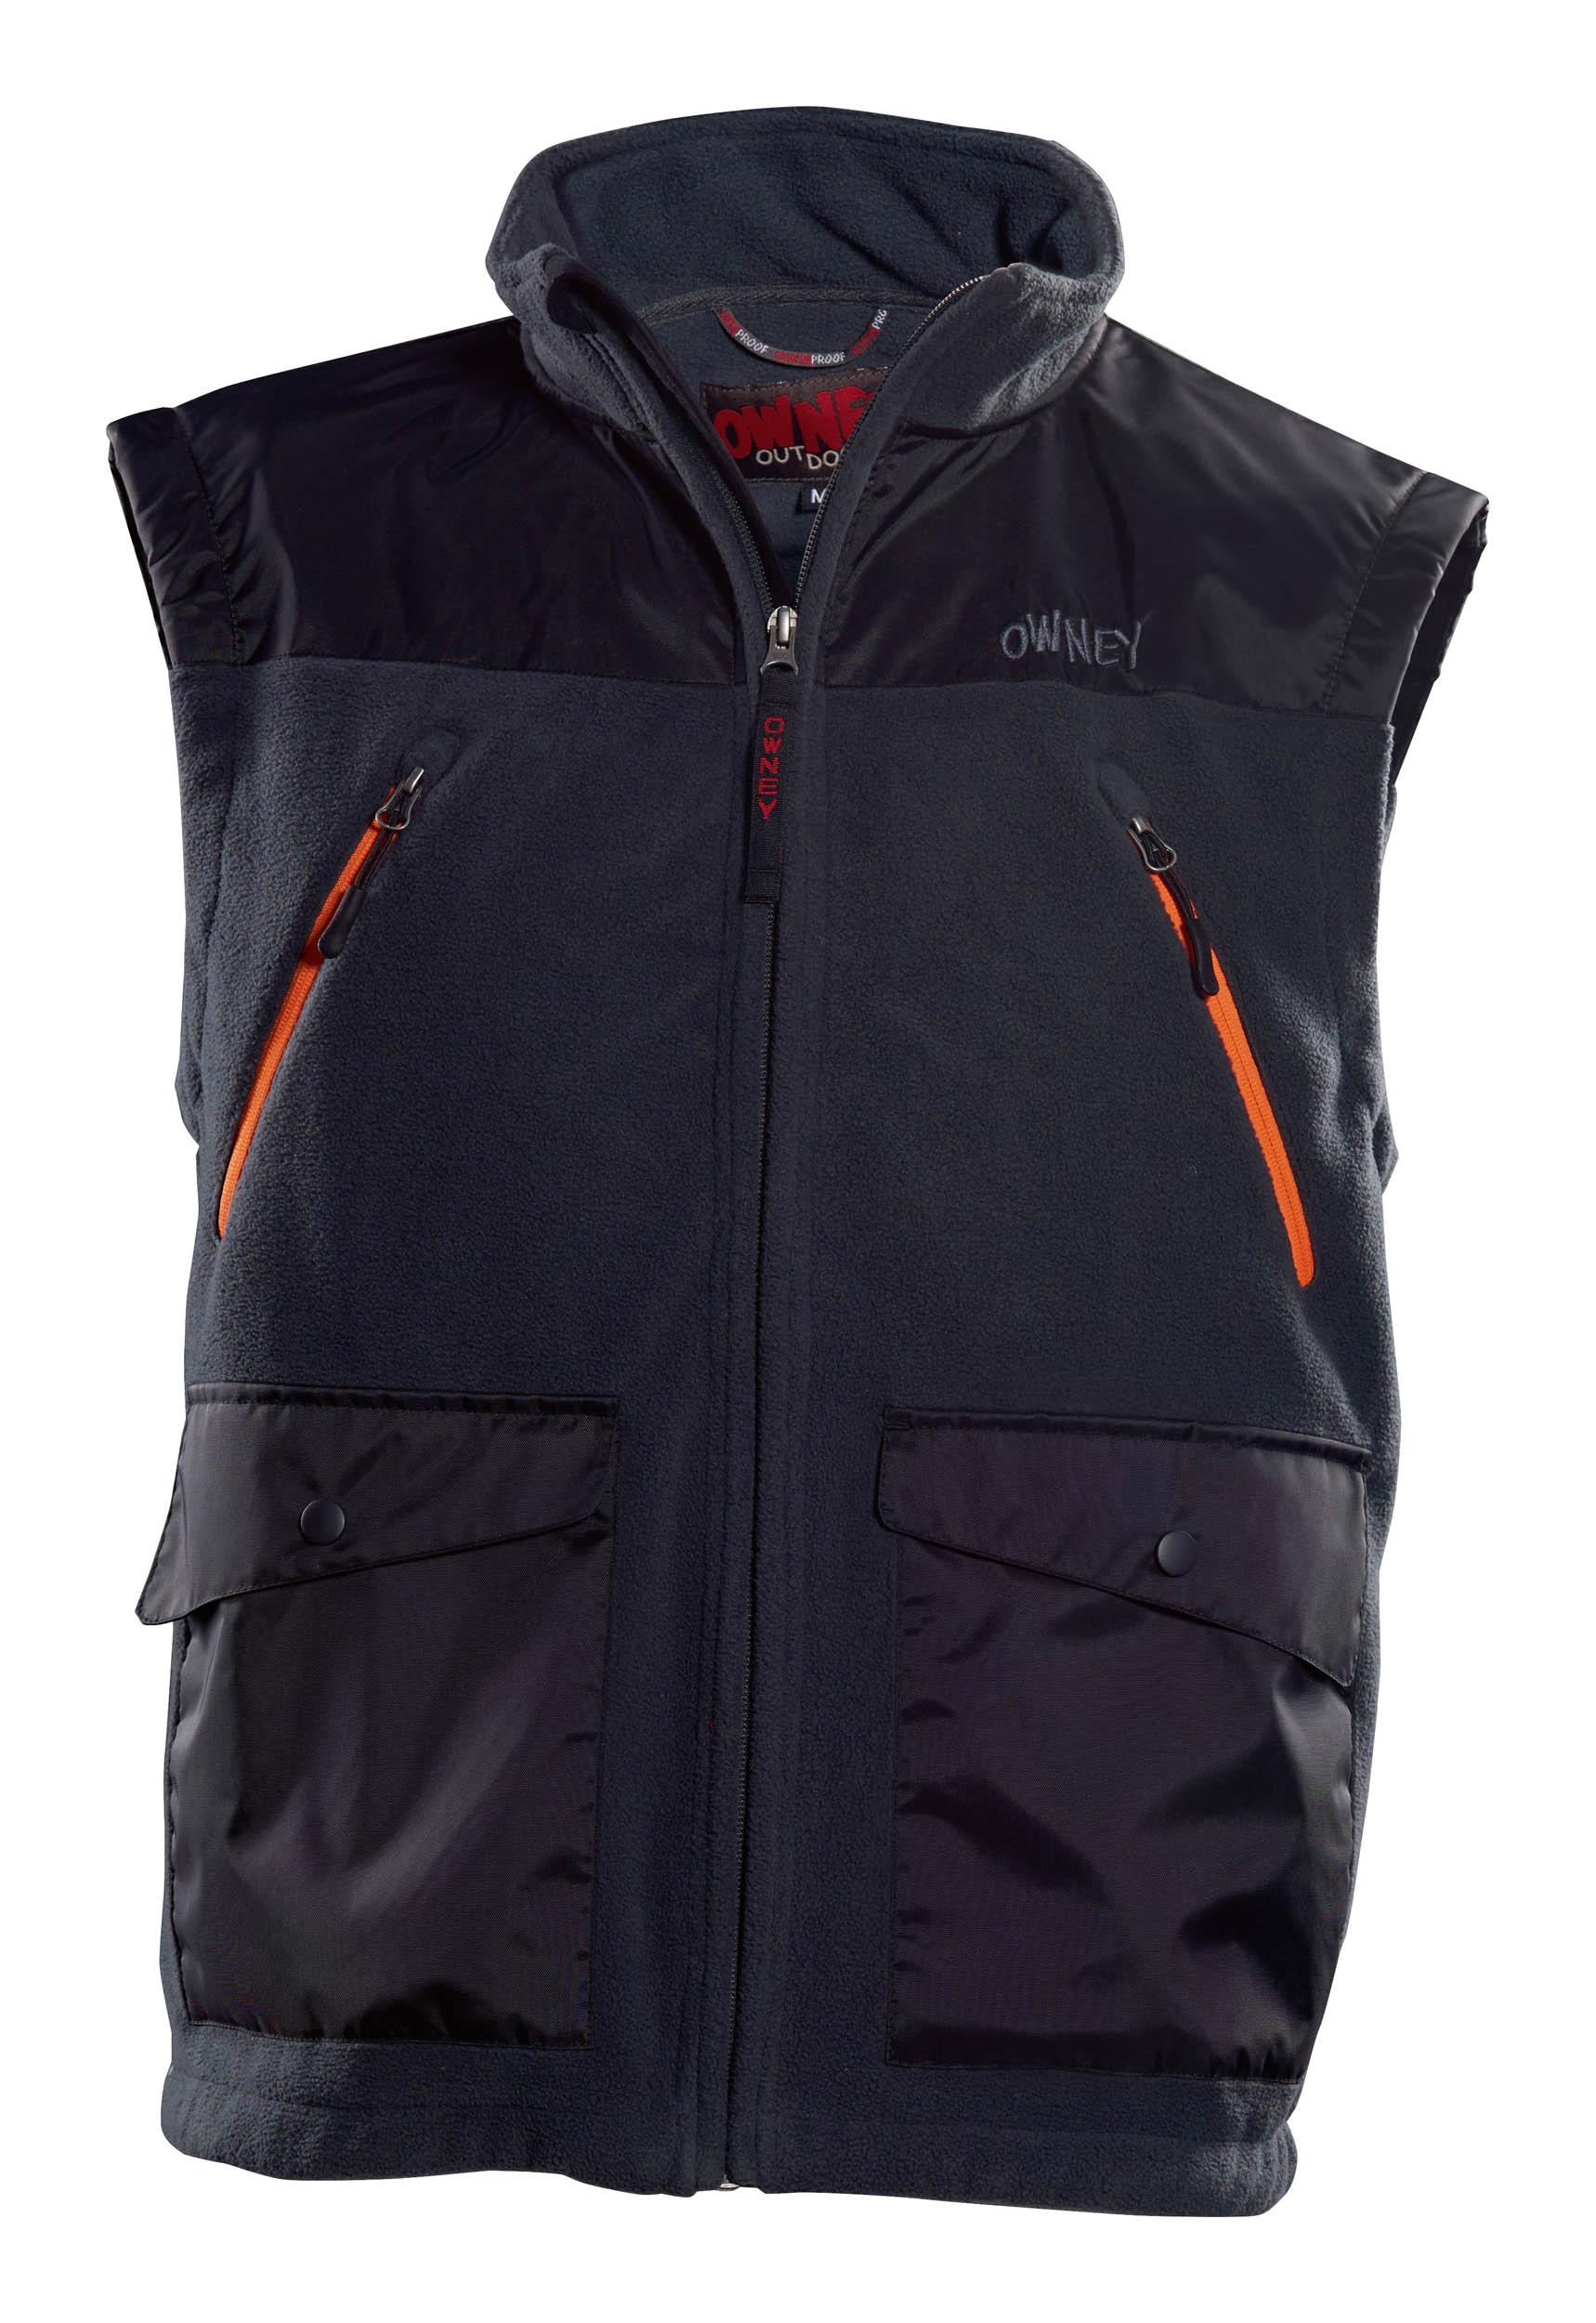 Owney Companion Fleece Vest anthracite